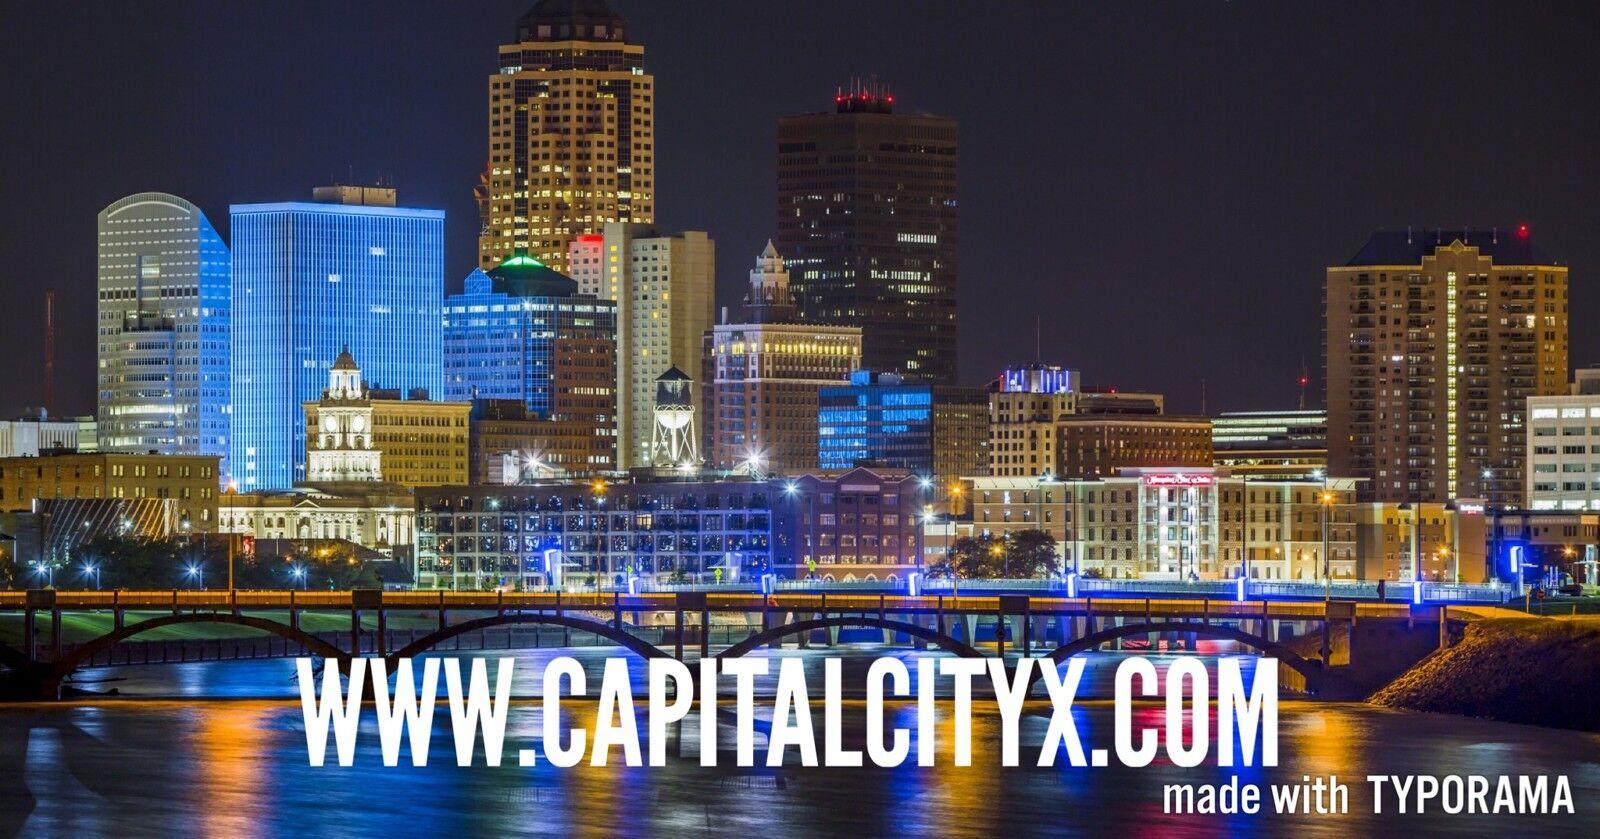 Capital City X